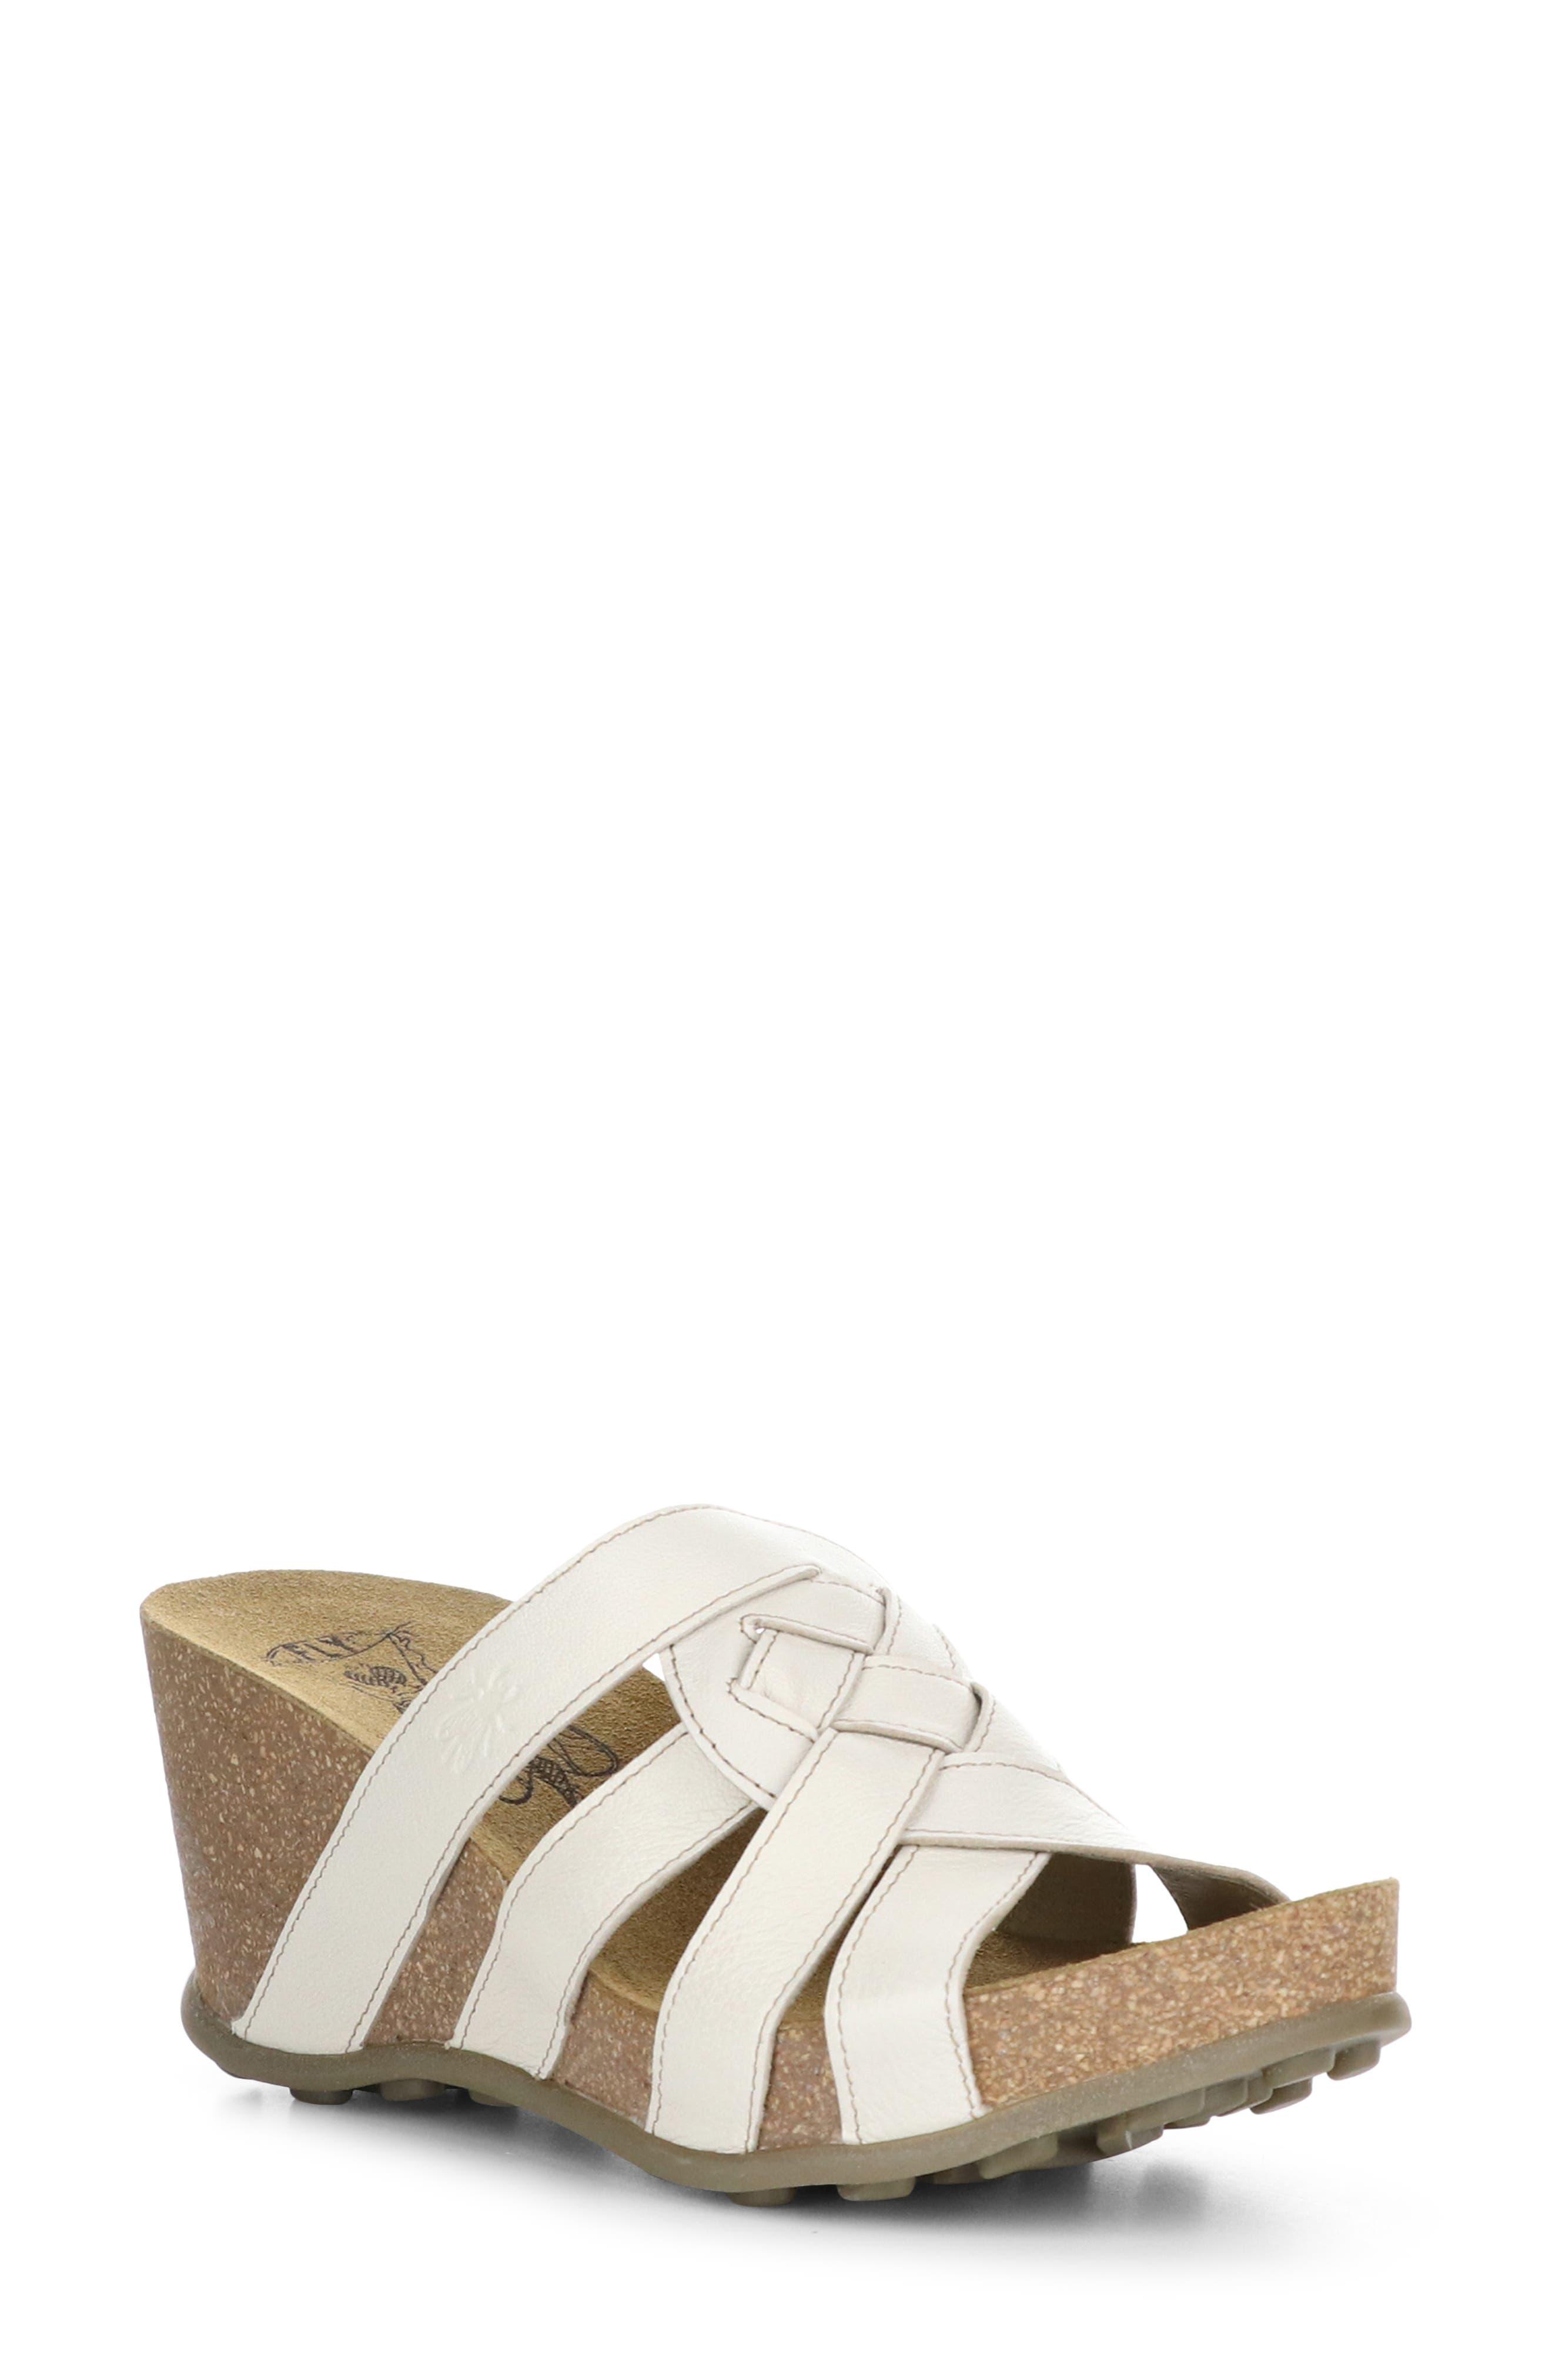 Gily Wedge Sandal